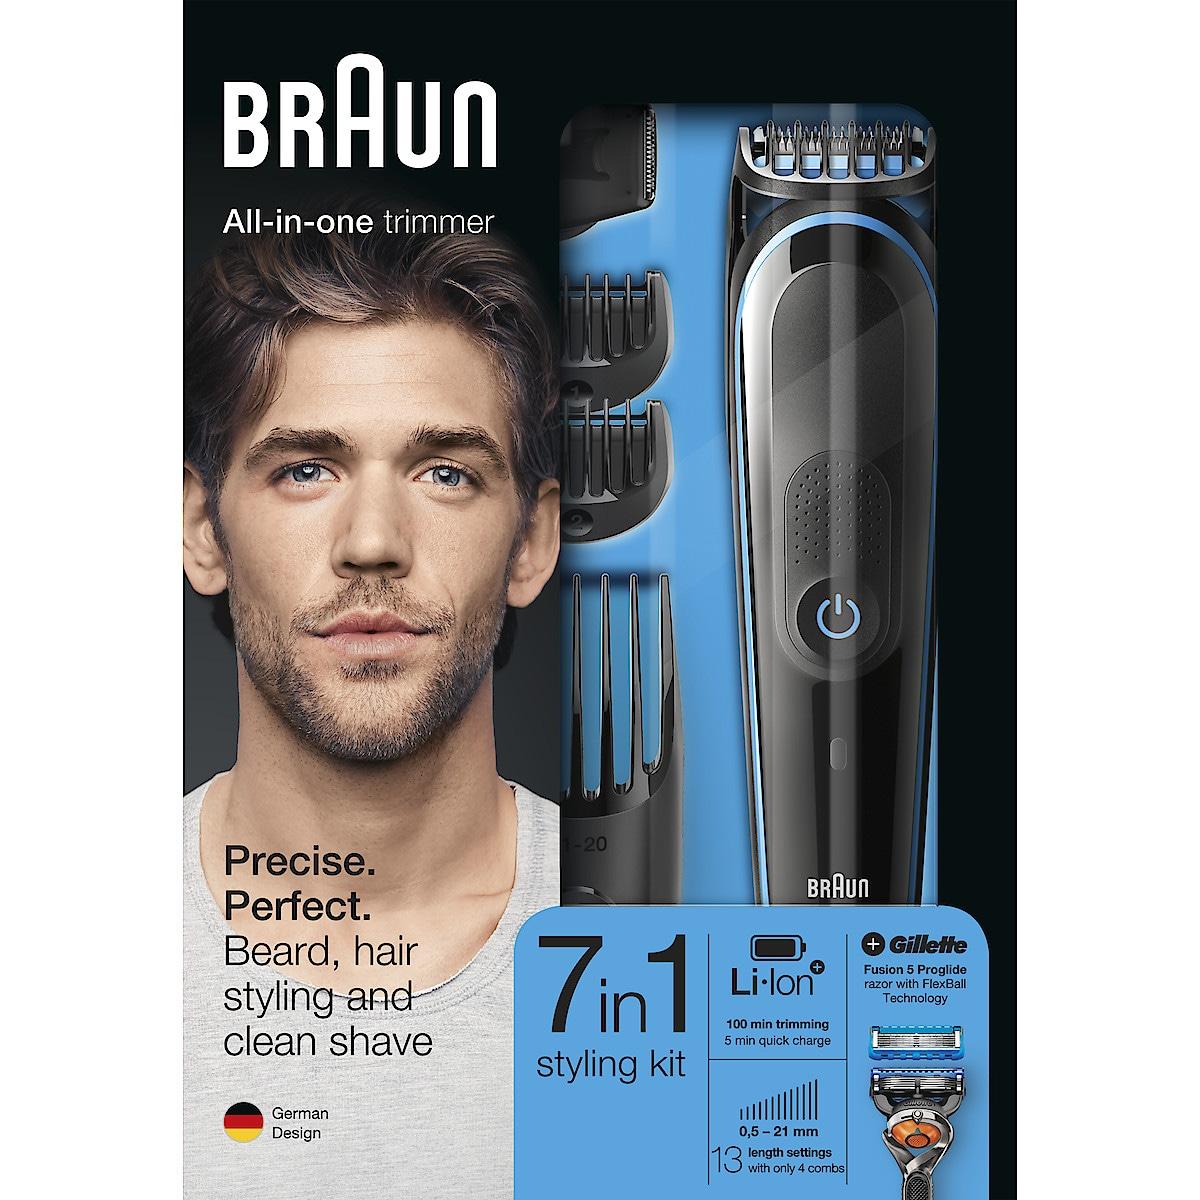 Multitrimmeri Braun MGK5045 All-in-one